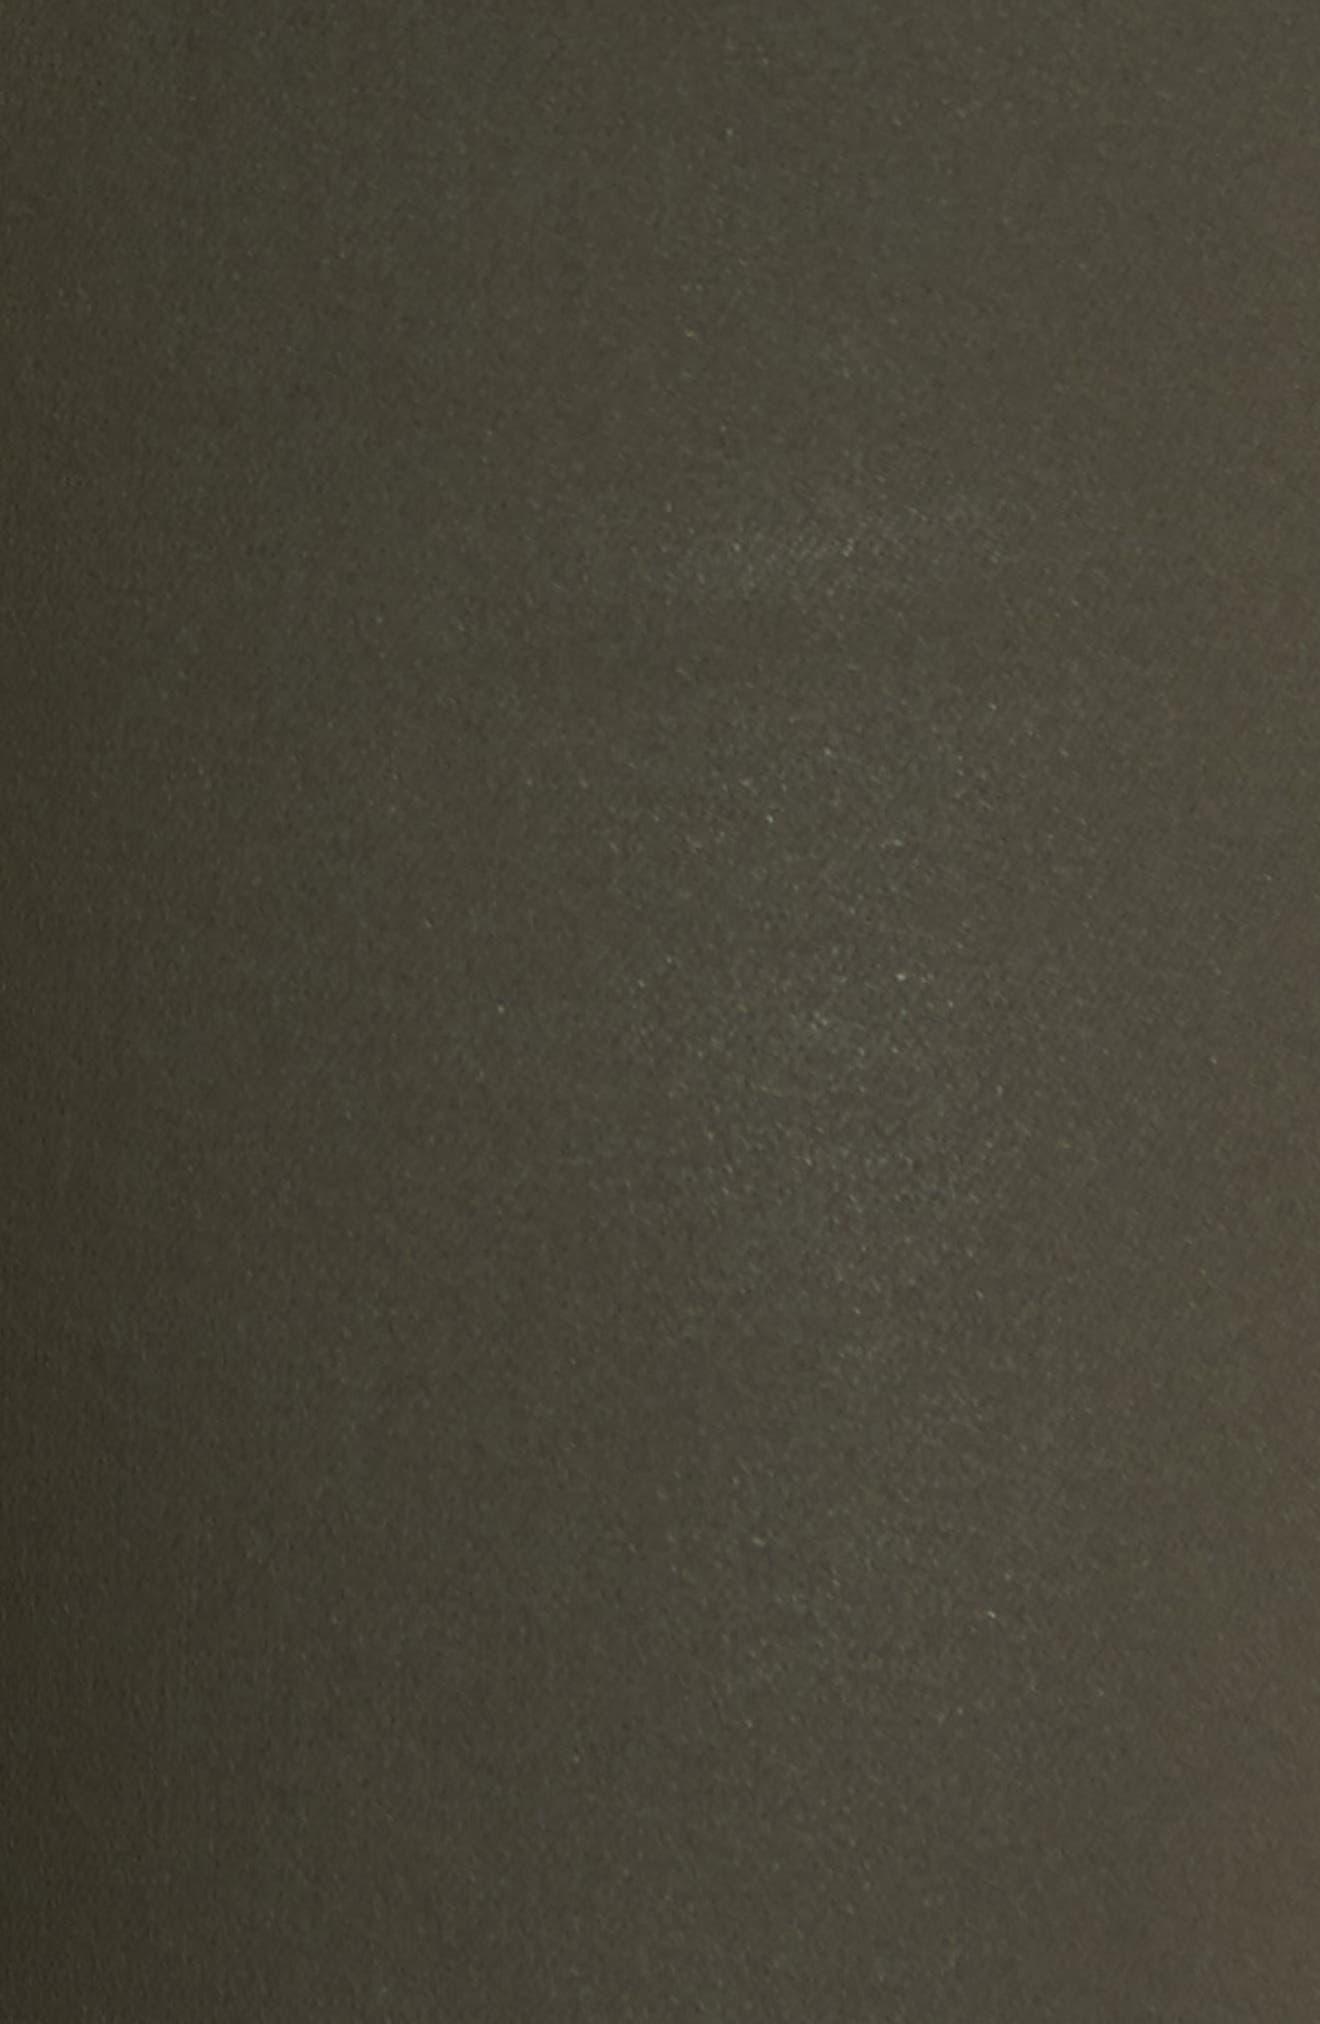 Sarah Coated Skinny Jeans,                             Alternate thumbnail 5, color,                             317